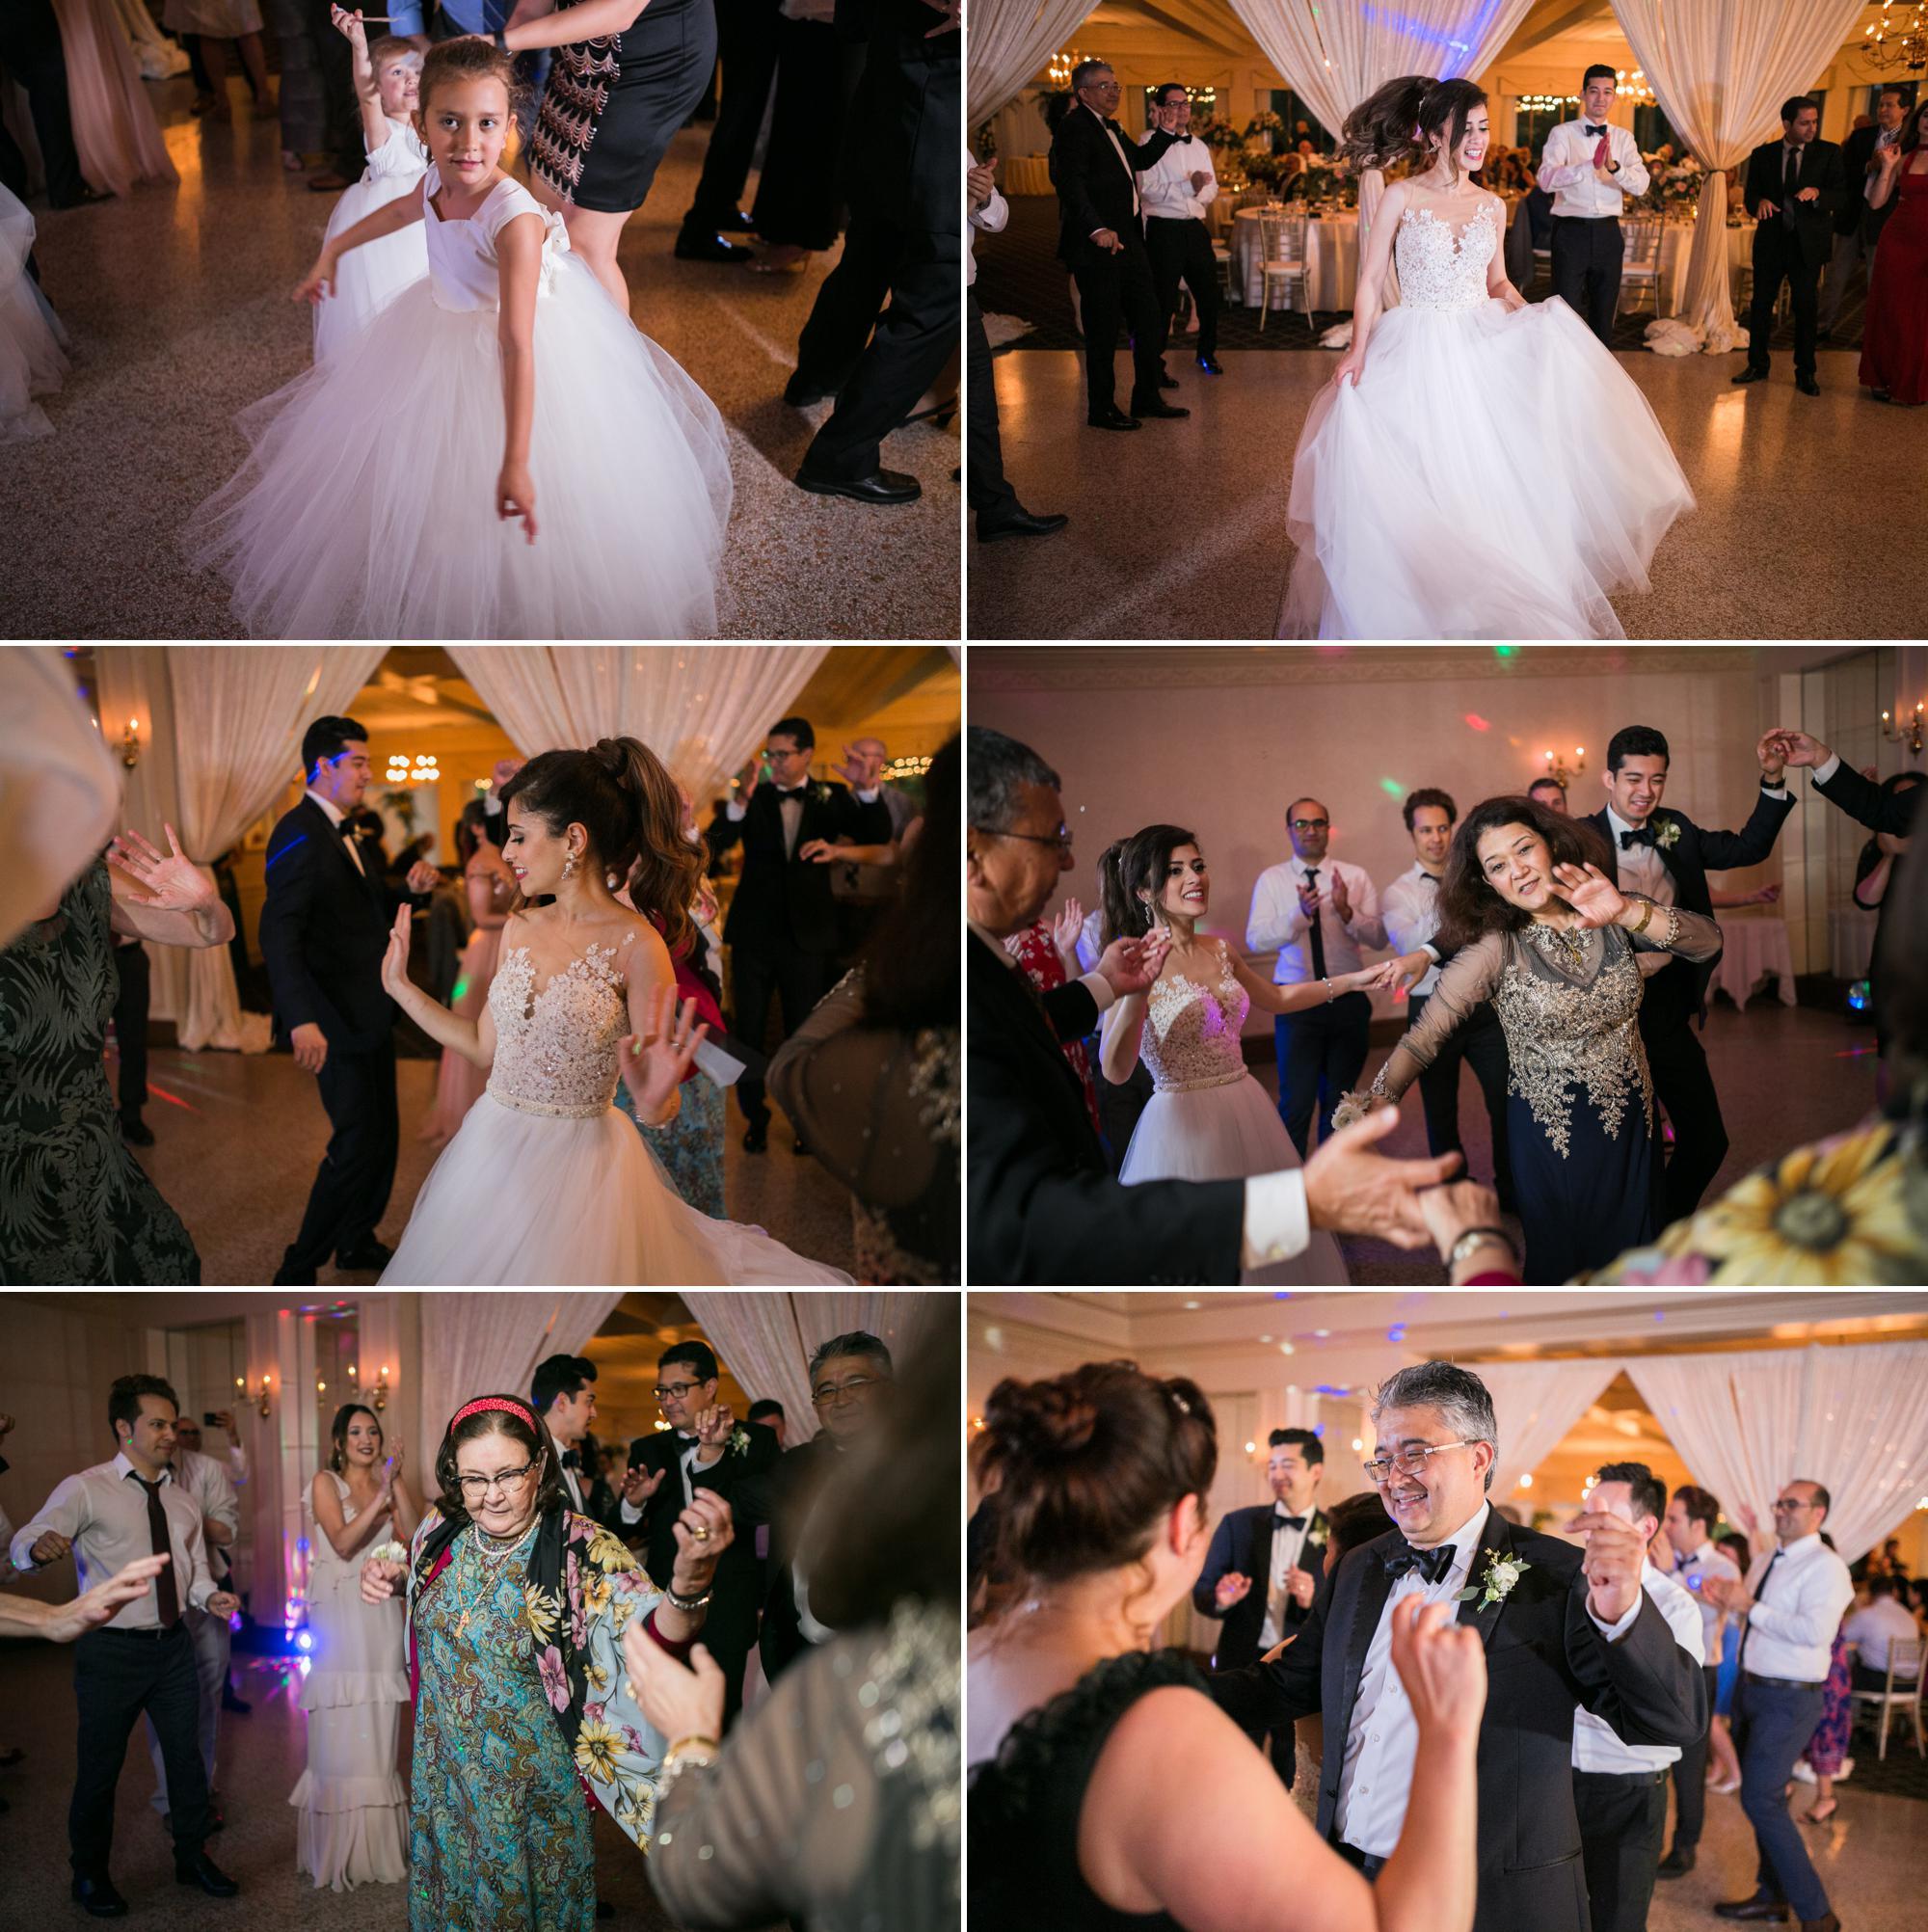 sylvania-country-club-wedding-photos-209.jpg